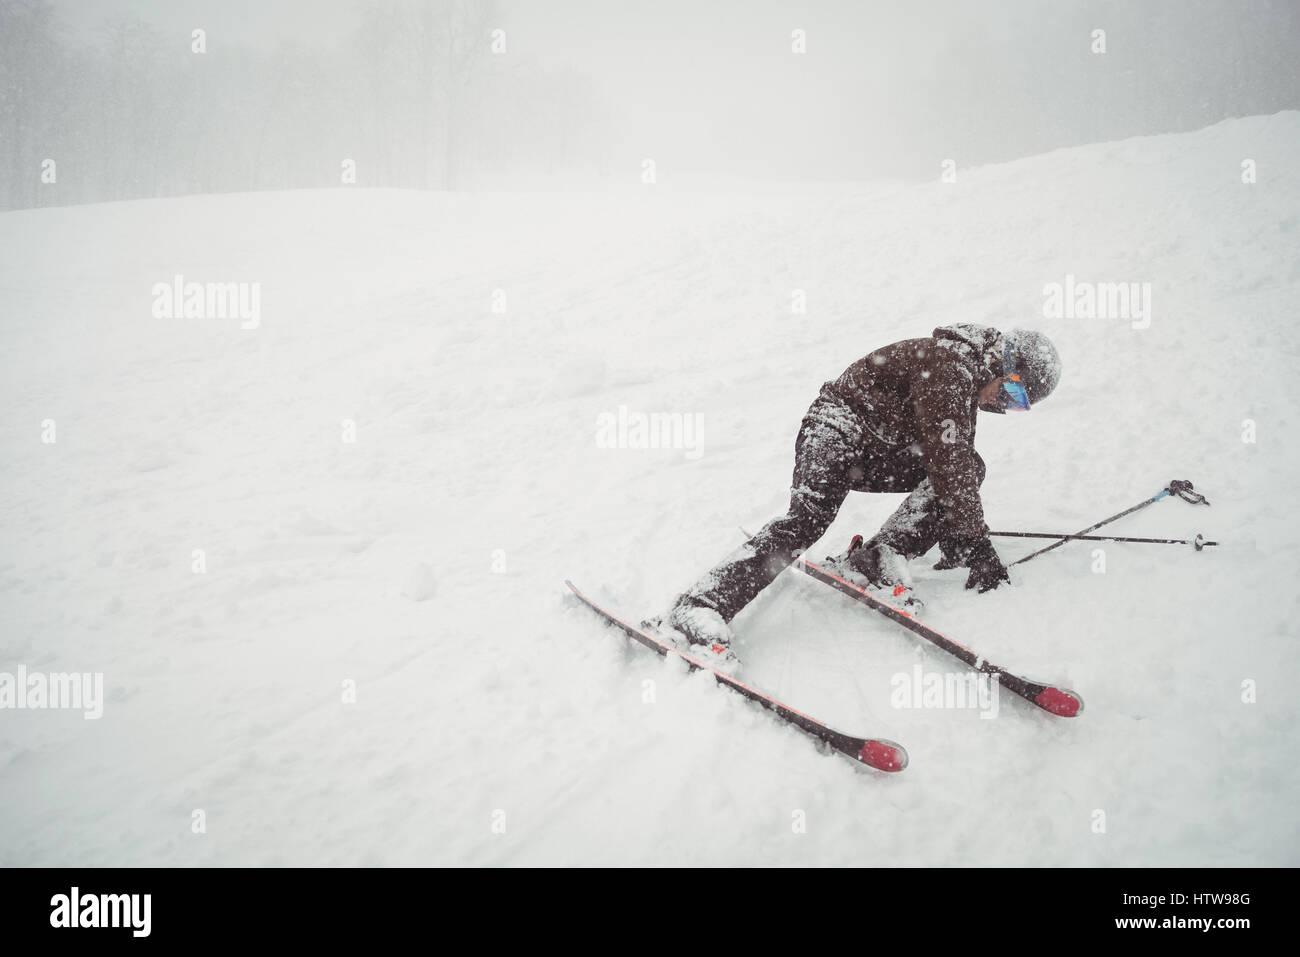 Ski fail of a man - Stock Image